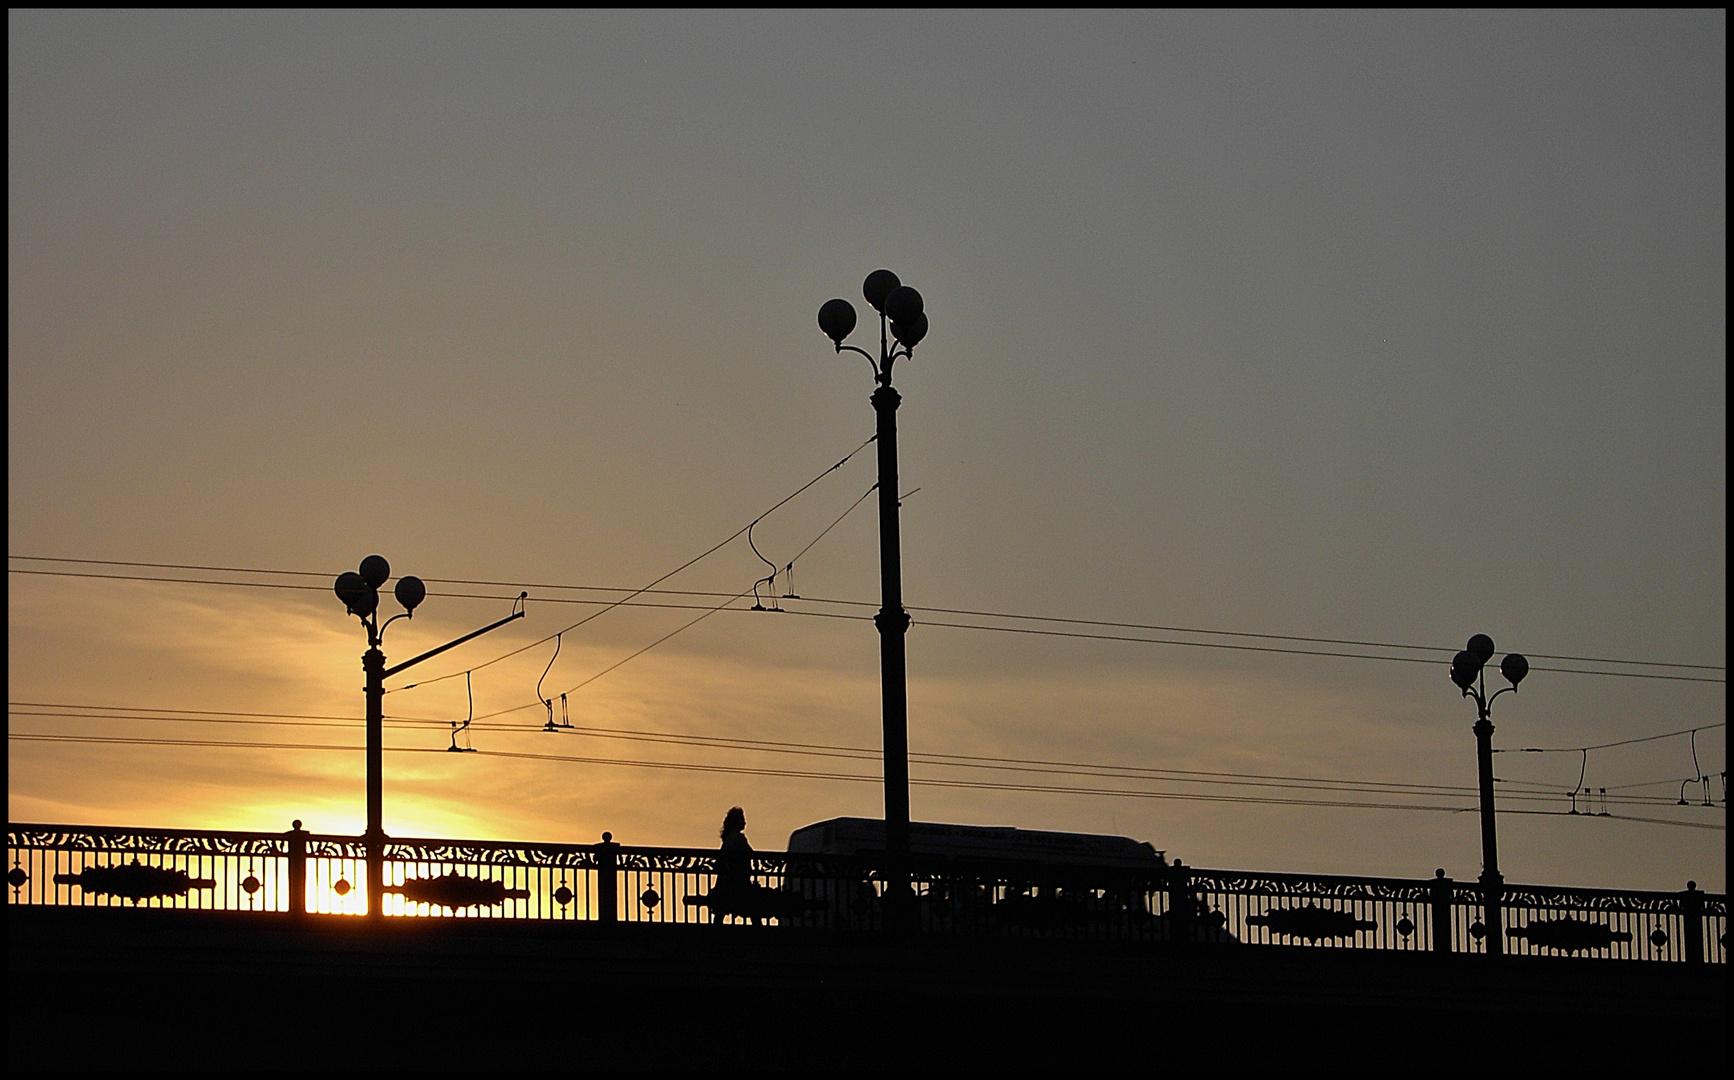 Brücke in Vilnius bei Sonnenuntergang